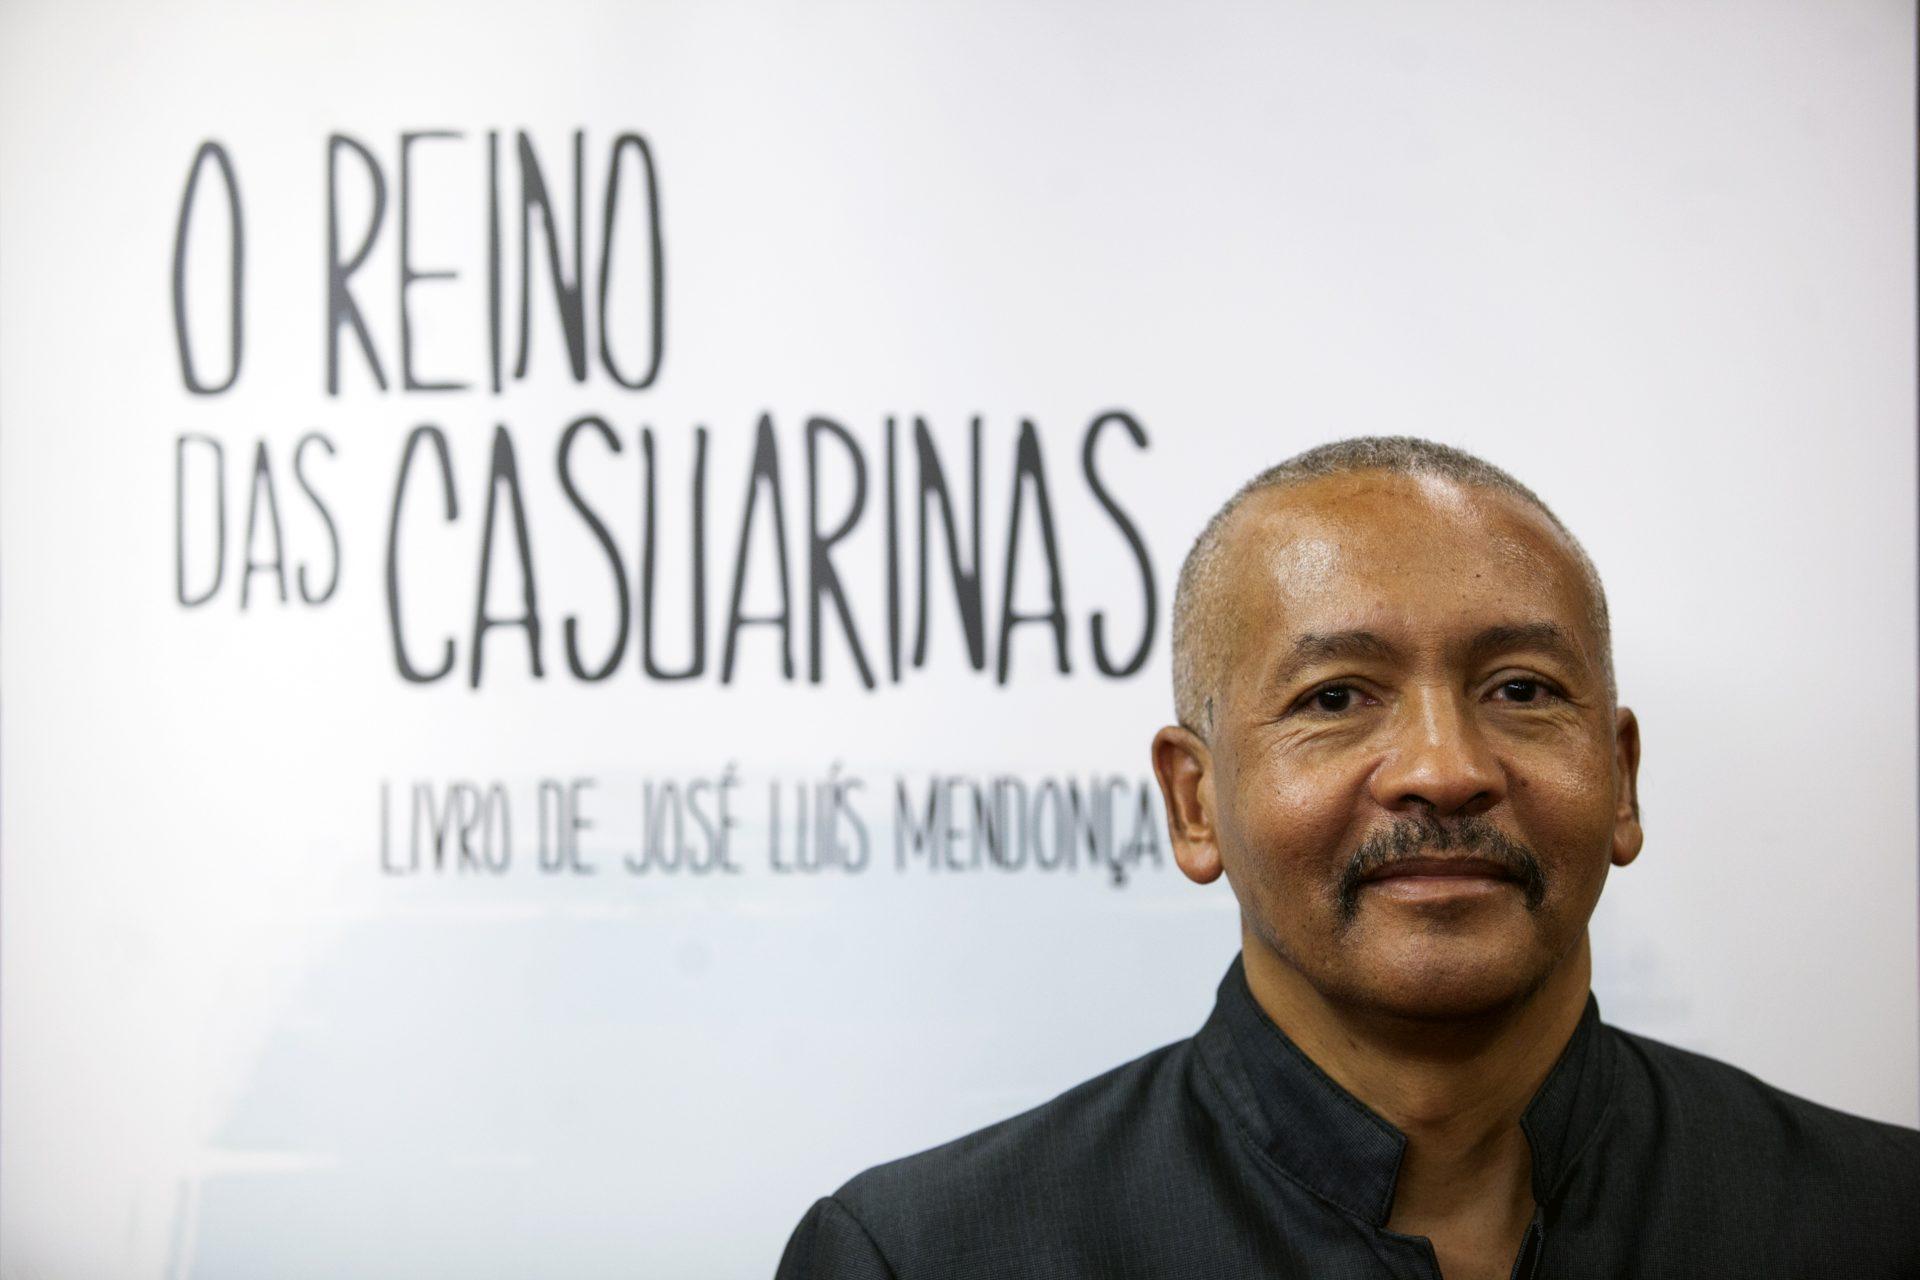 Jose Luis Mendonca